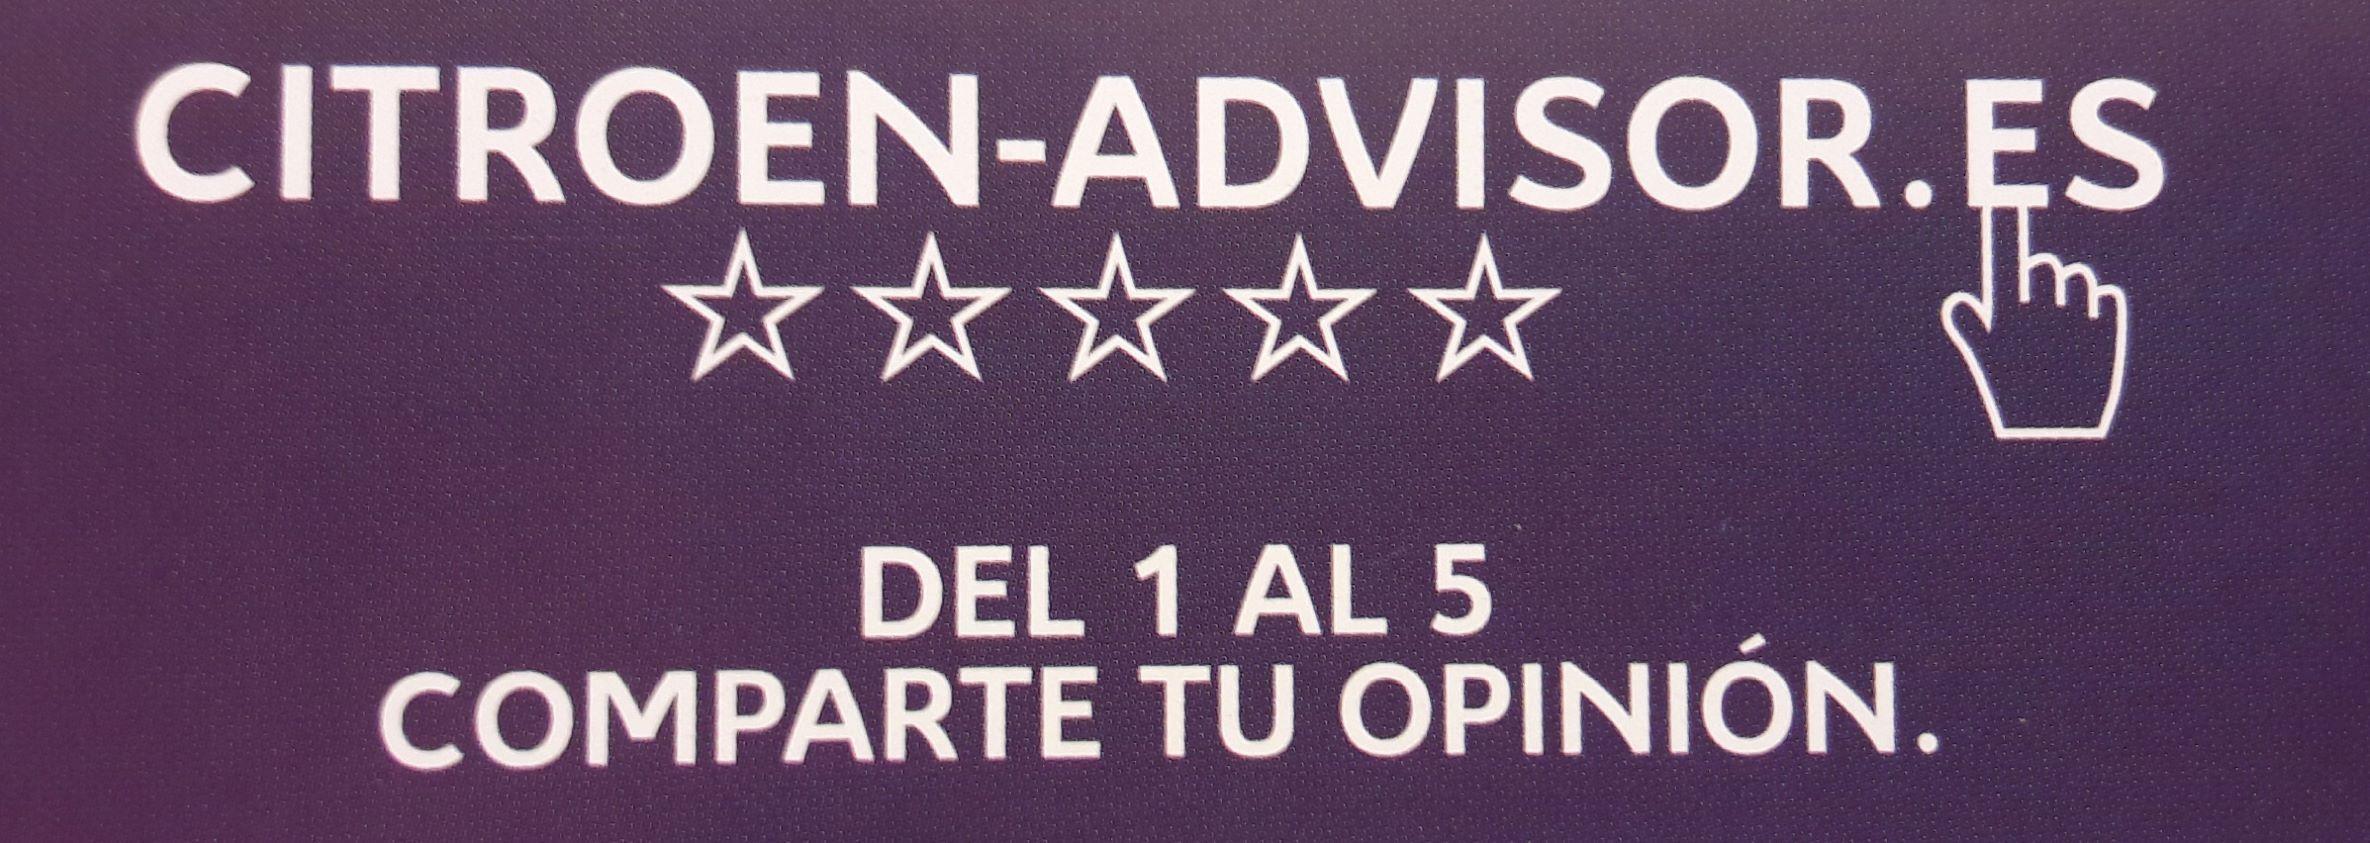 ¿QUE OPINAN LOS CLIENTES  DE SAEZ TORRENS?